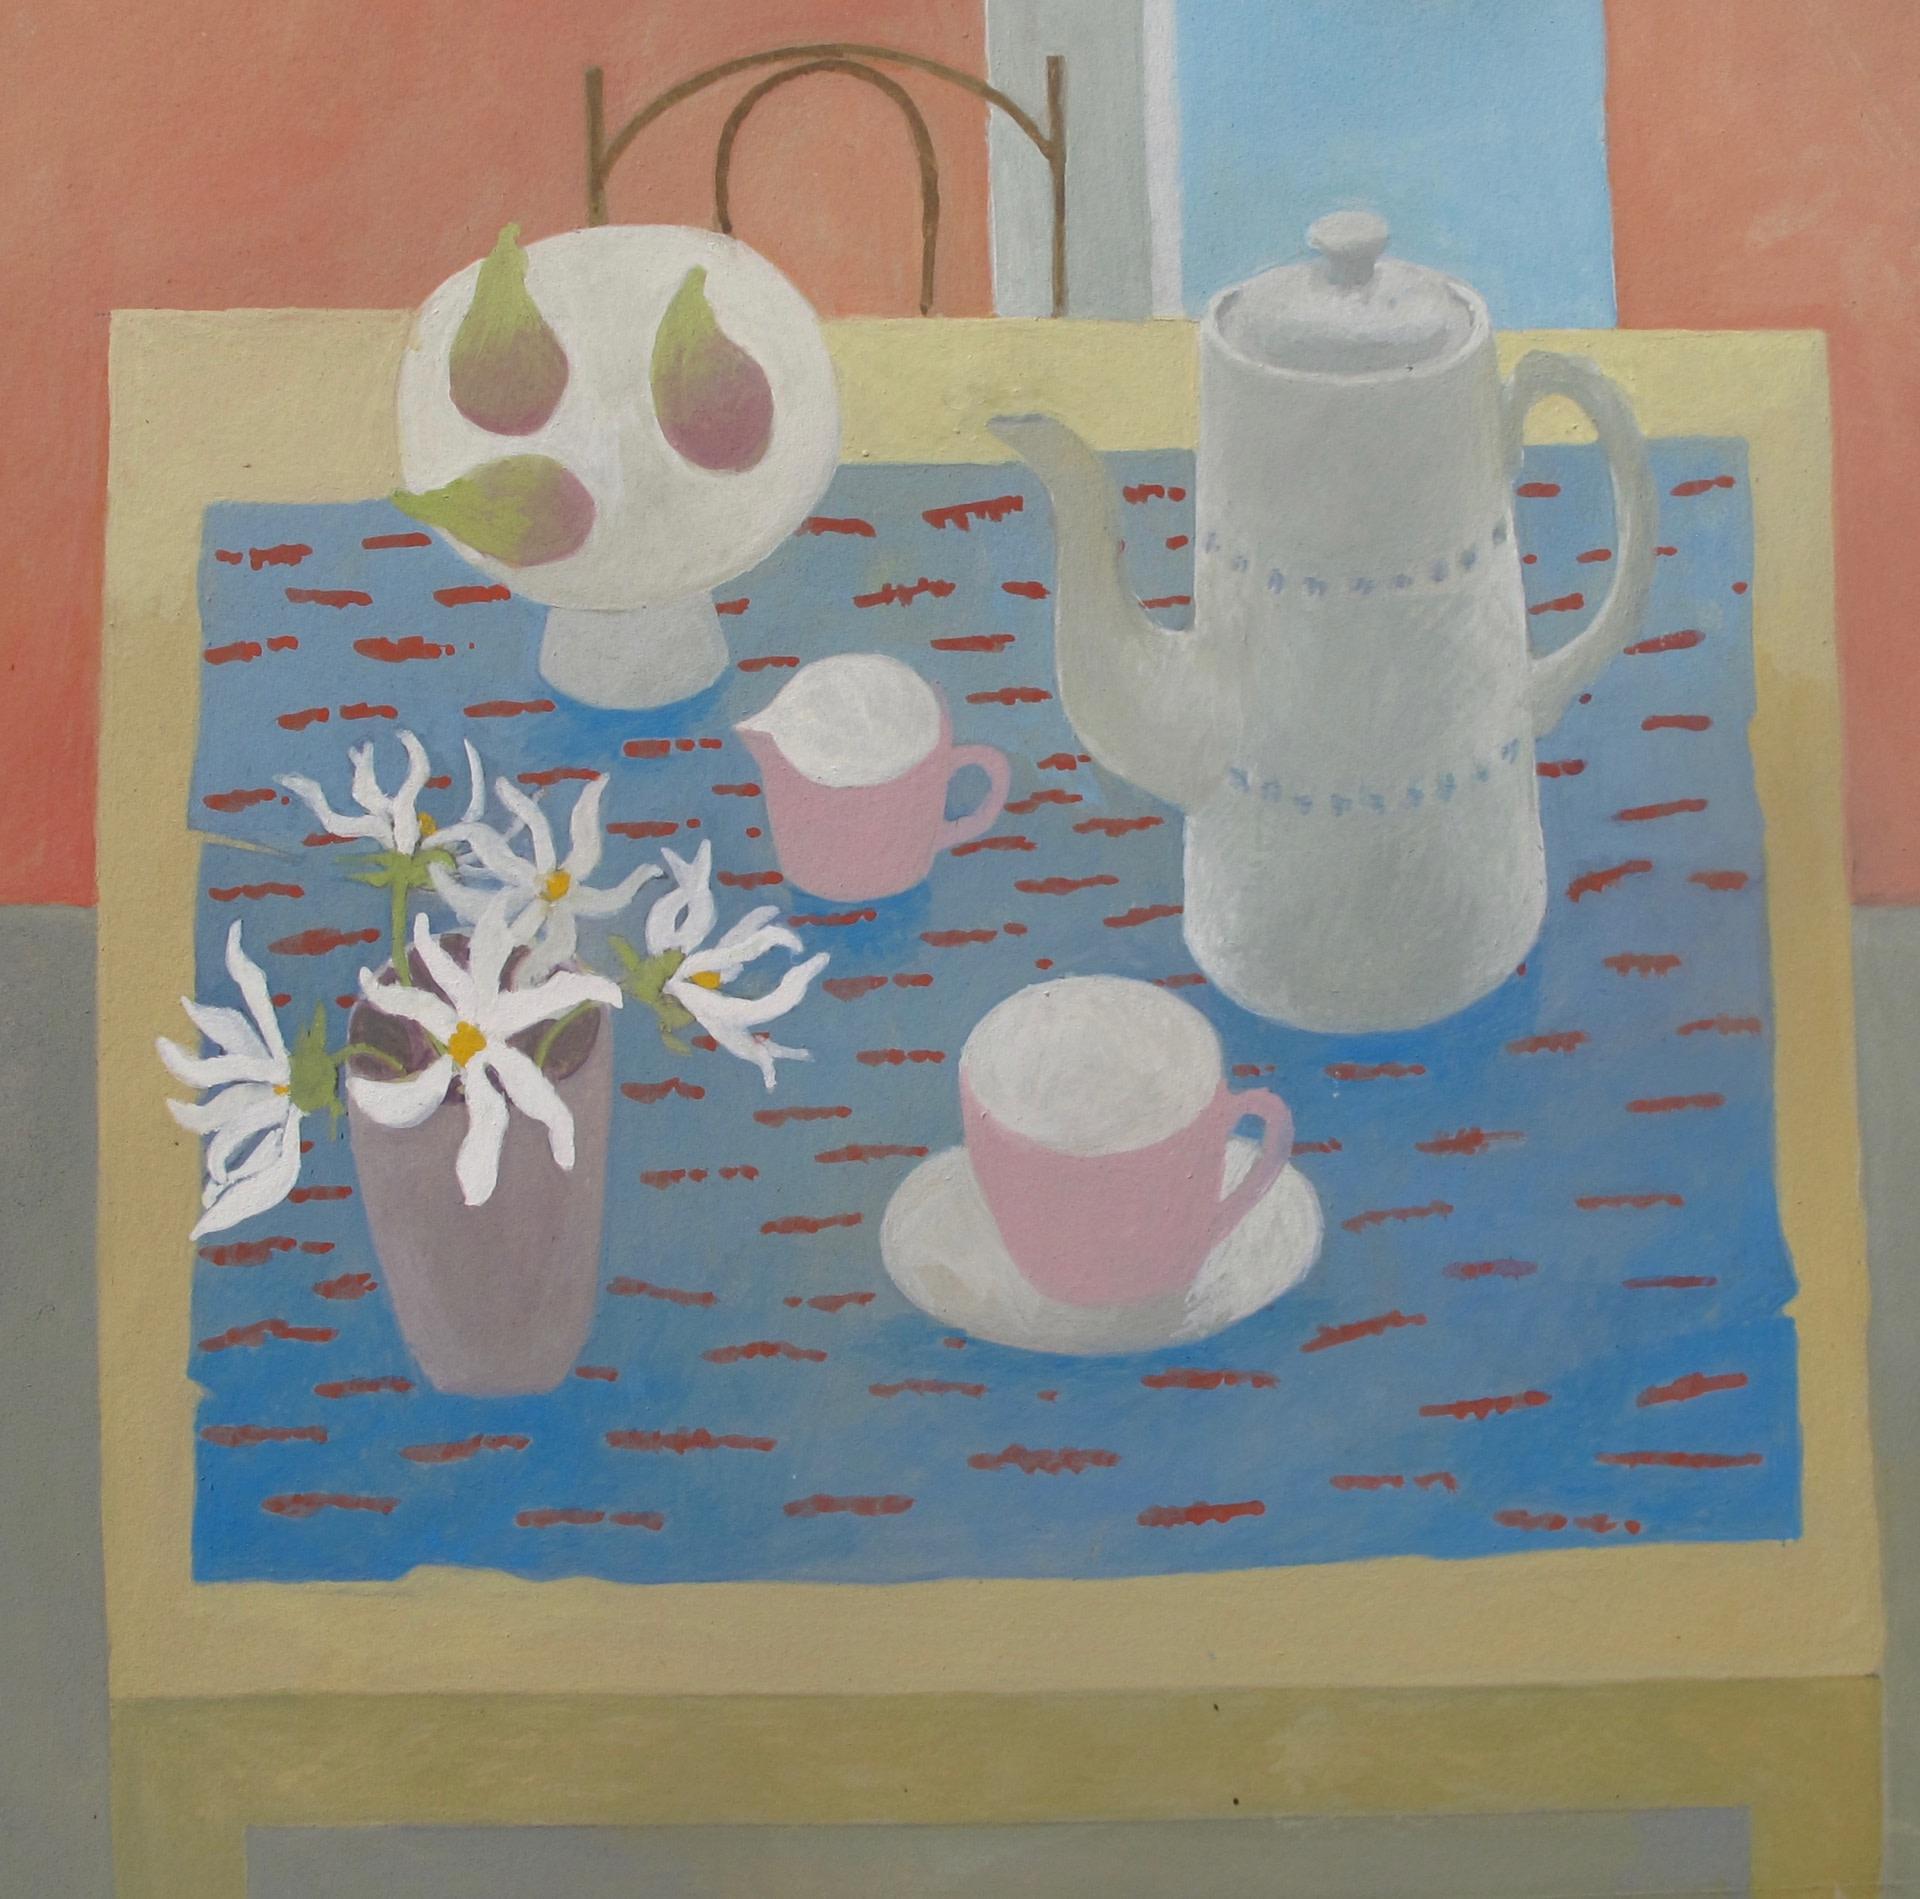 "<span class=""link fancybox-details-link""><a href=""/artists/74-wendy-jacob/works/12393-wendy-jacob-coffee-pot-and-white-dahlias/"">View Detail Page</a></span><div class=""artist""><span class=""artist""><strong>Wendy Jacob</strong></span></div><div class=""title""><em>Coffee Pot and White Dahlias</em></div><div class=""medium"">gouache</div><div class=""dimensions"">Frame: 49 x 49 cm<br /> Artwork: 28 x 28 cm</div><div class=""price"">£575.00</div>"